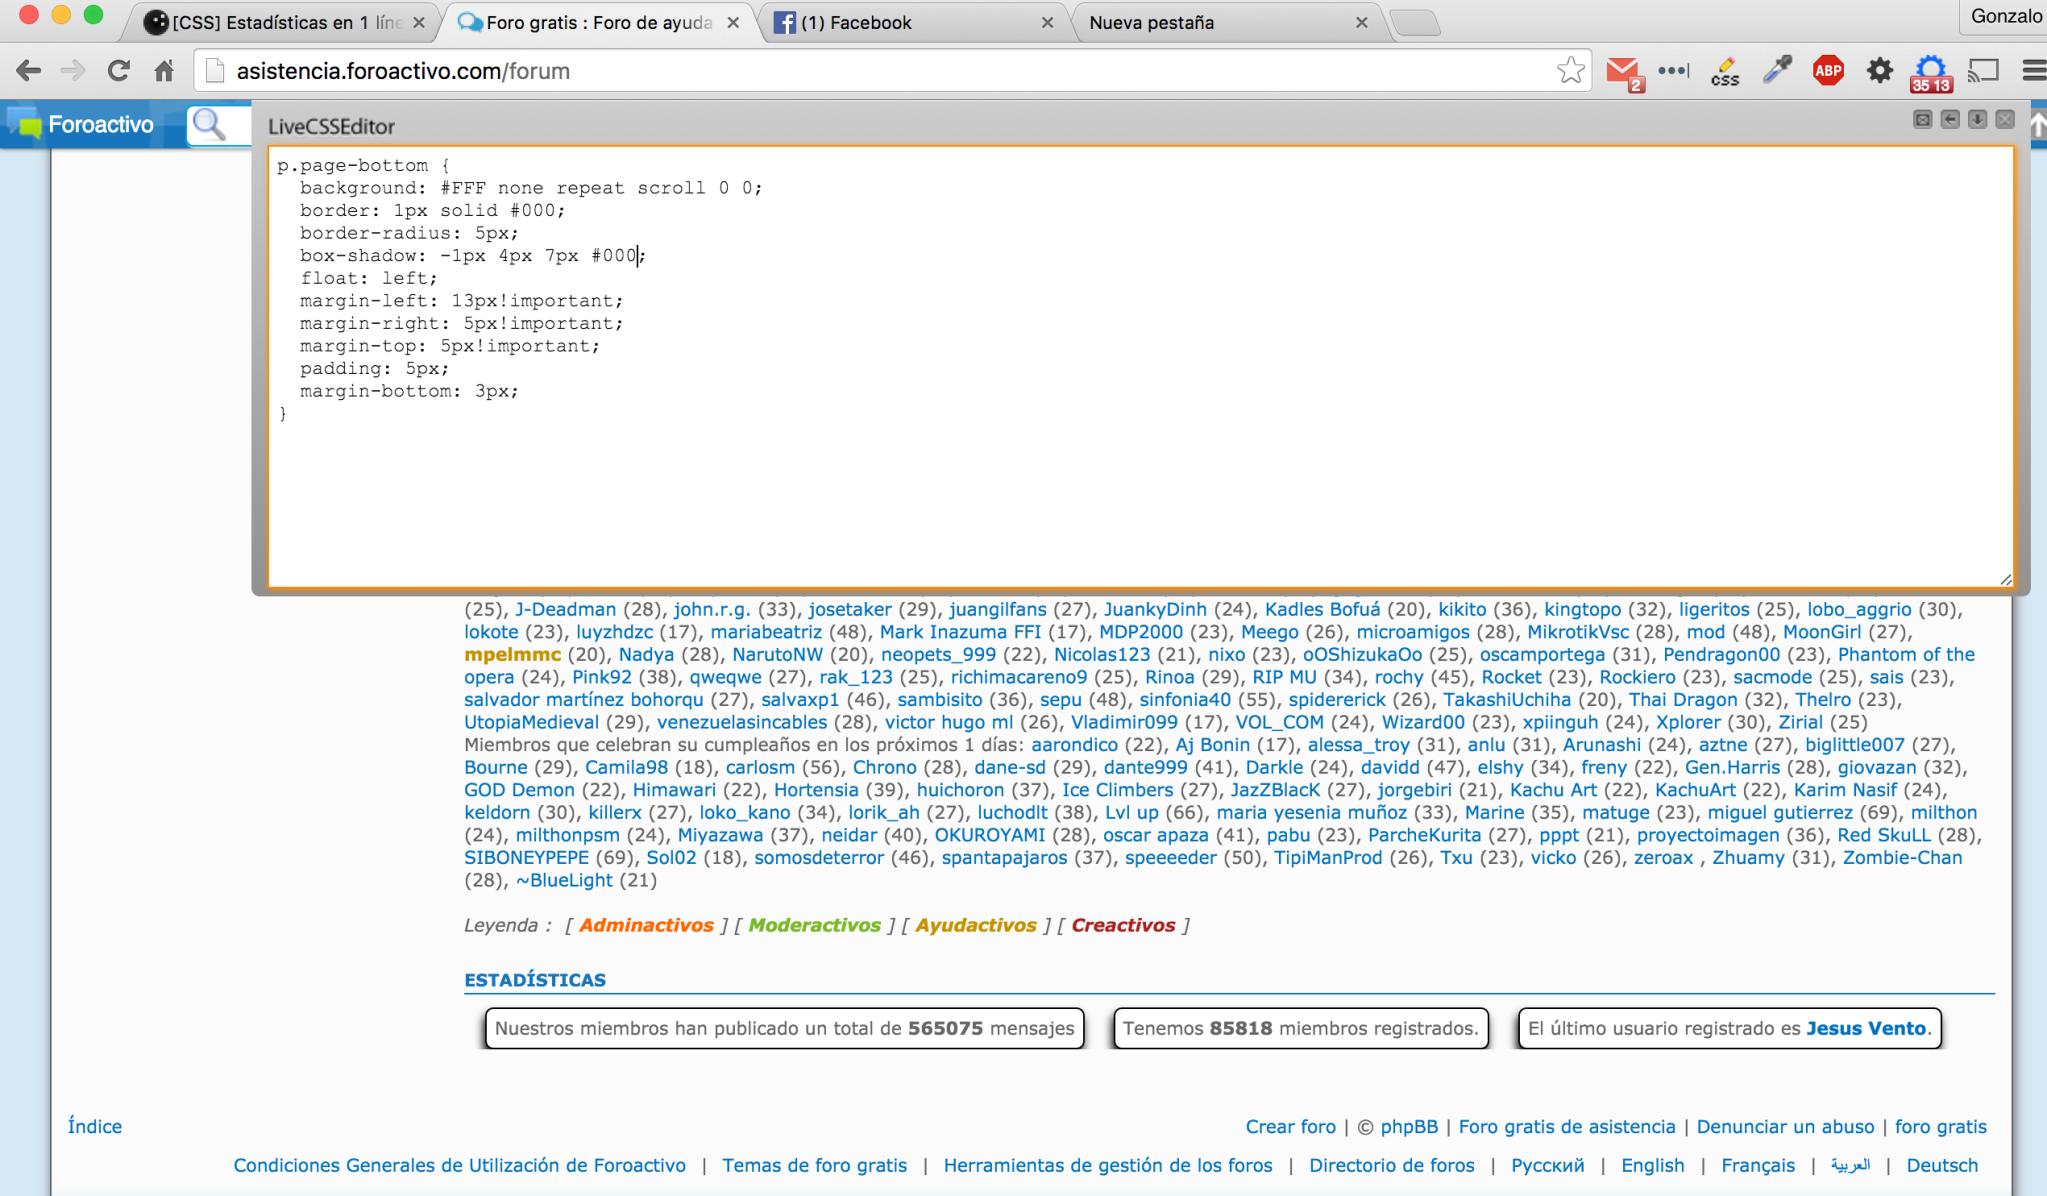 [CSS] Estadísticas en 1 línea Xd579i